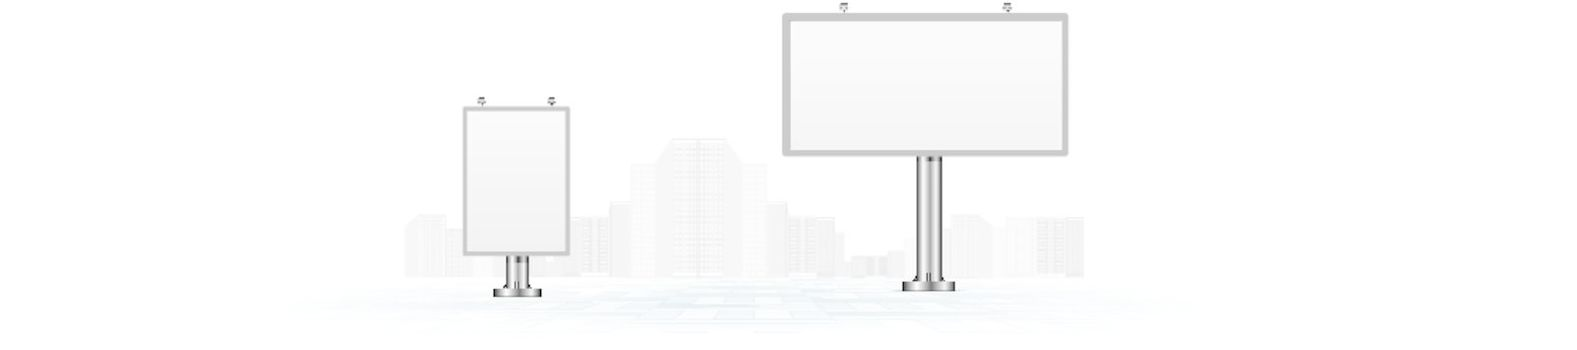 Billboards with gray urban horizon vector background